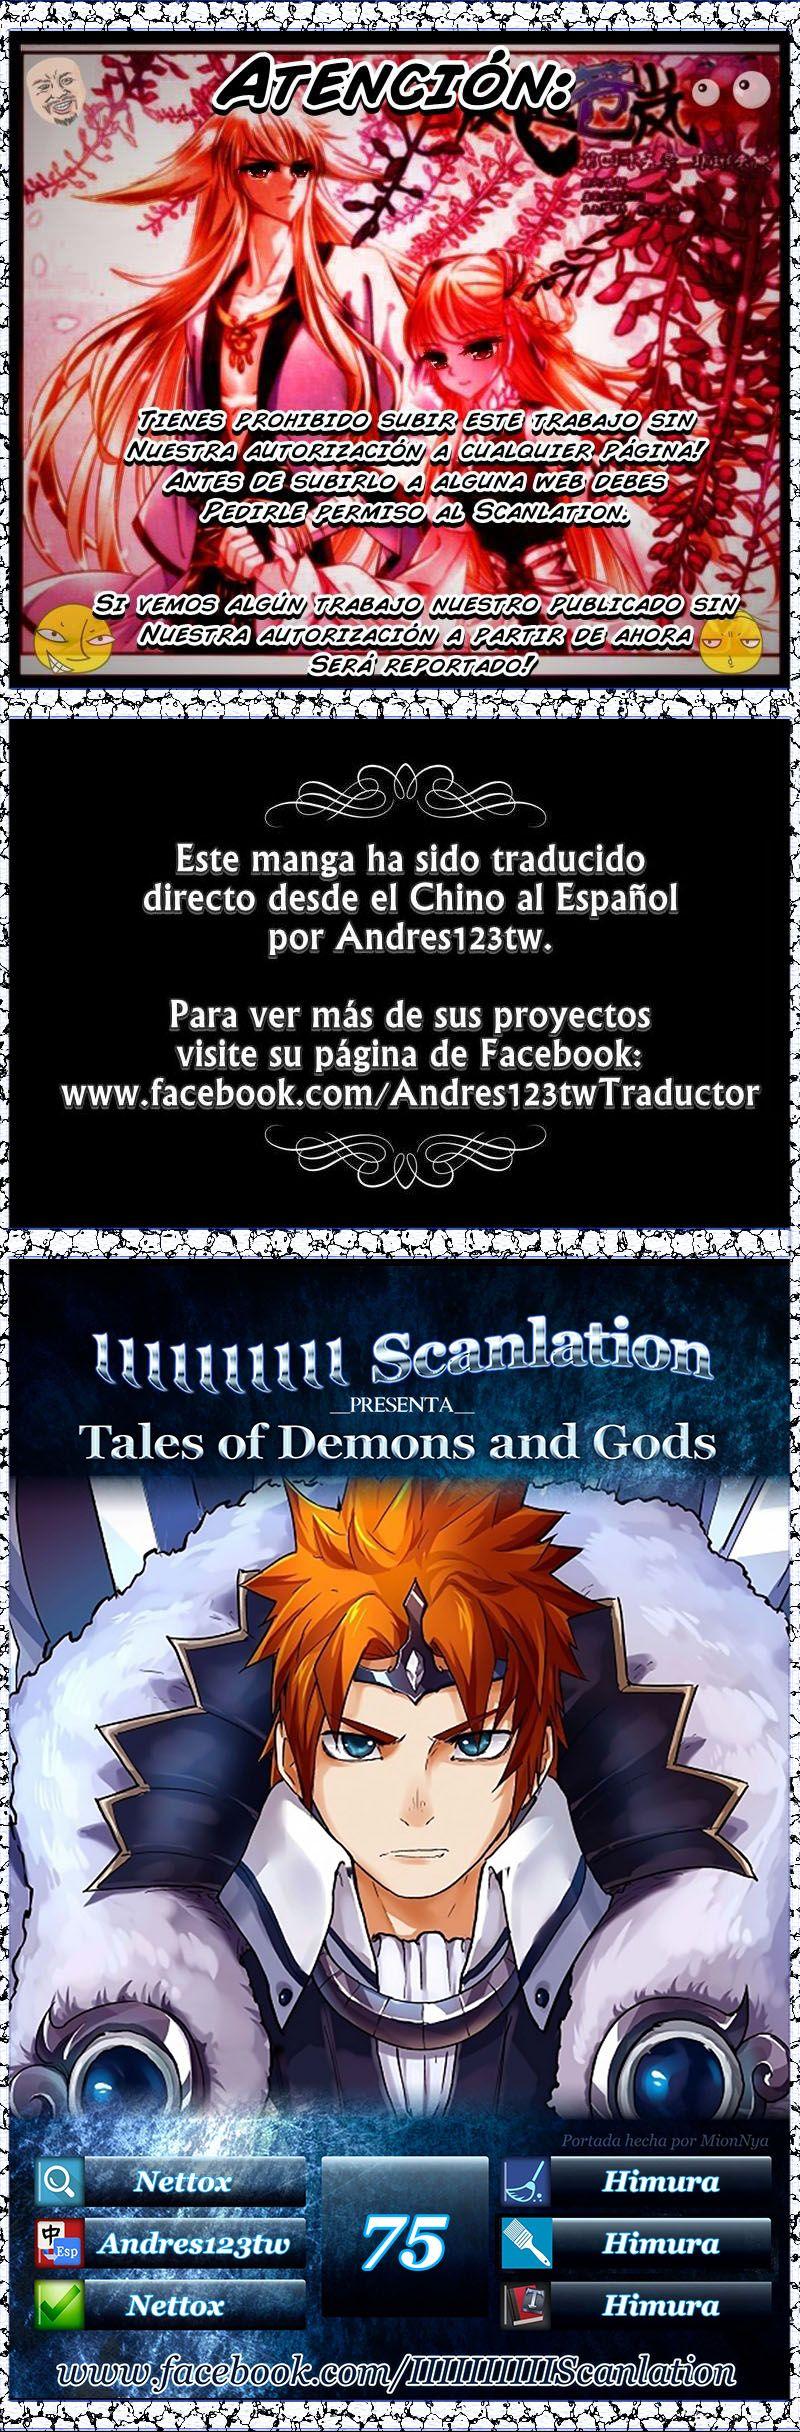 http://c5.ninemanga.com/es_manga/7/17735/458327/1264a061d82a2edae1574b07249800d6.jpg Page 1